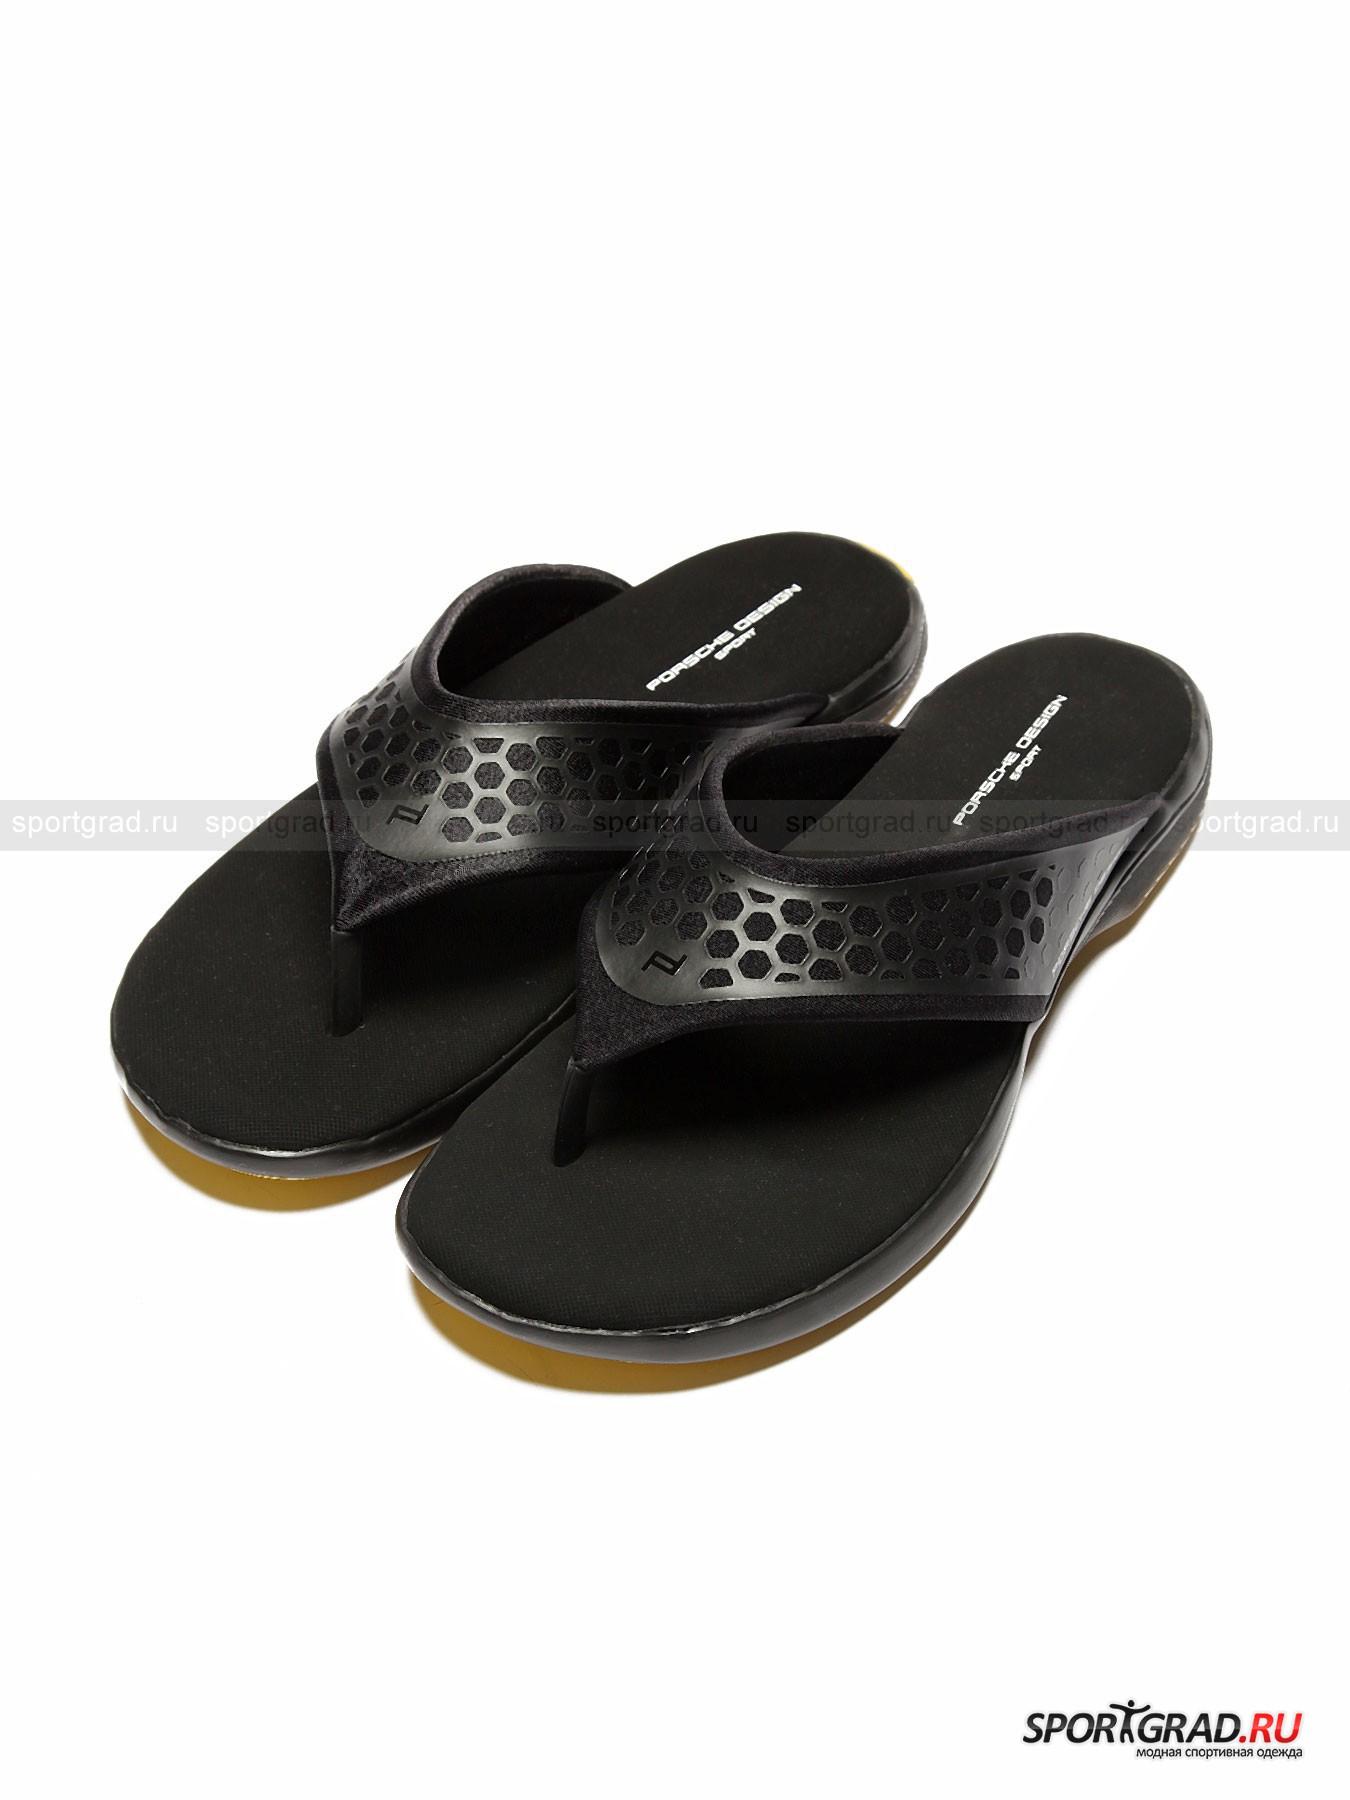 ������ ������� Summer Flip Flop PORSCHE DESIGN